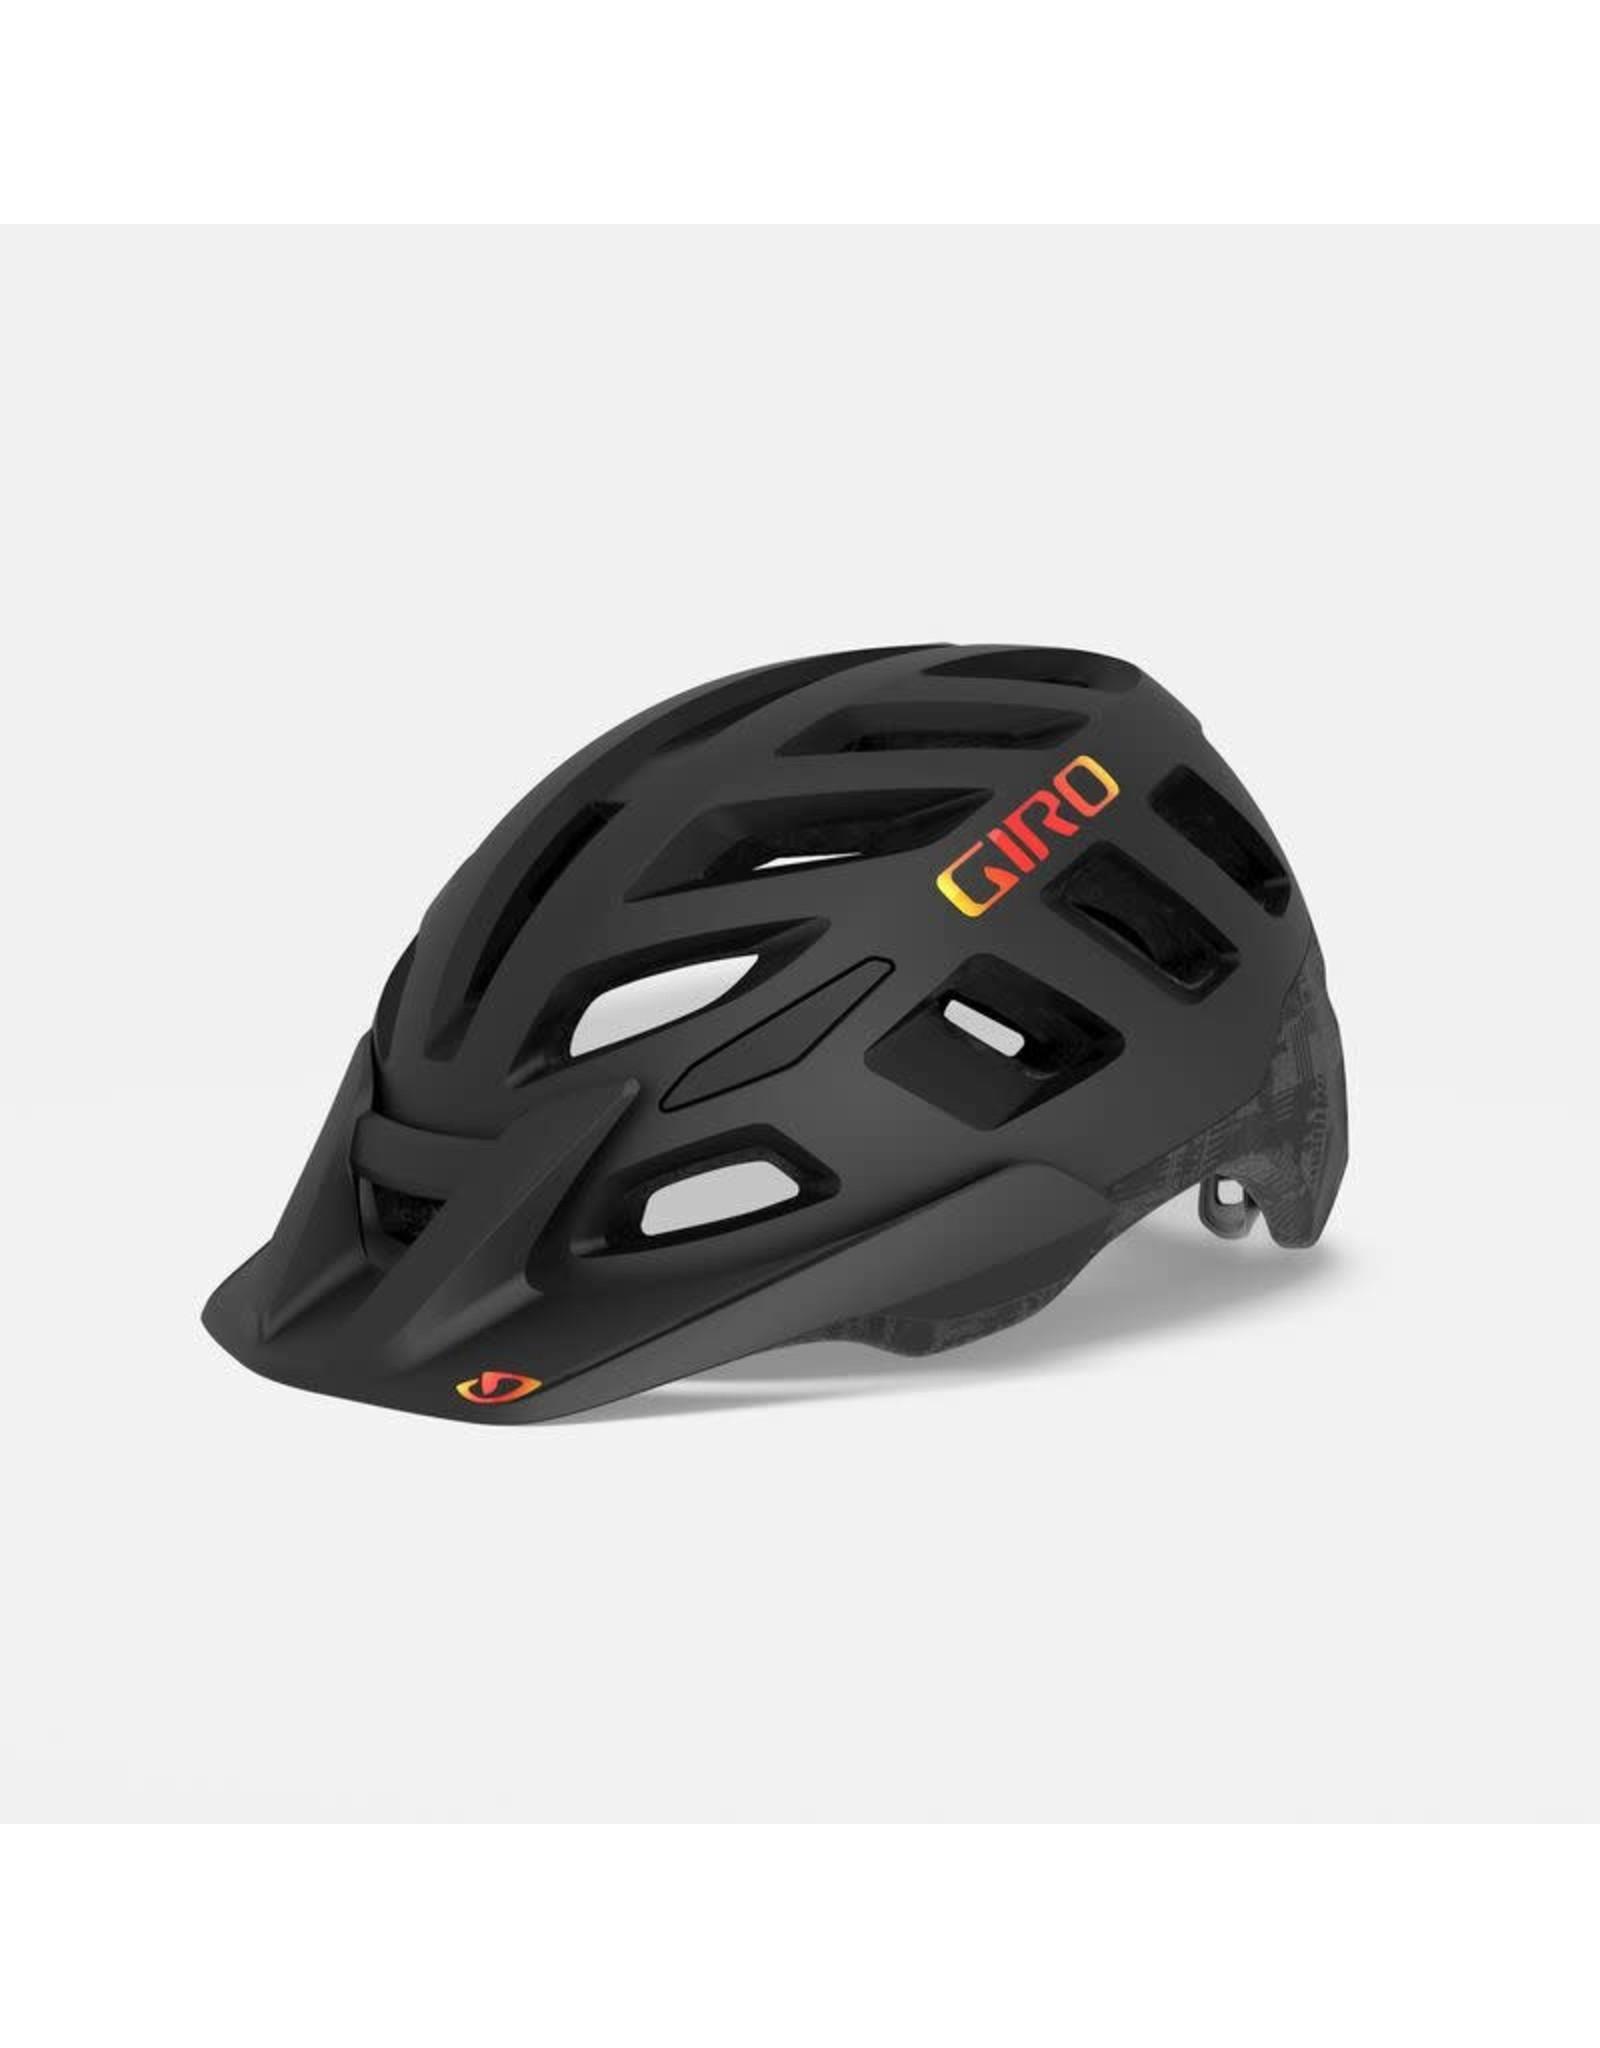 Giro Bike GR RADIX MIPS MAT BLK HYP L